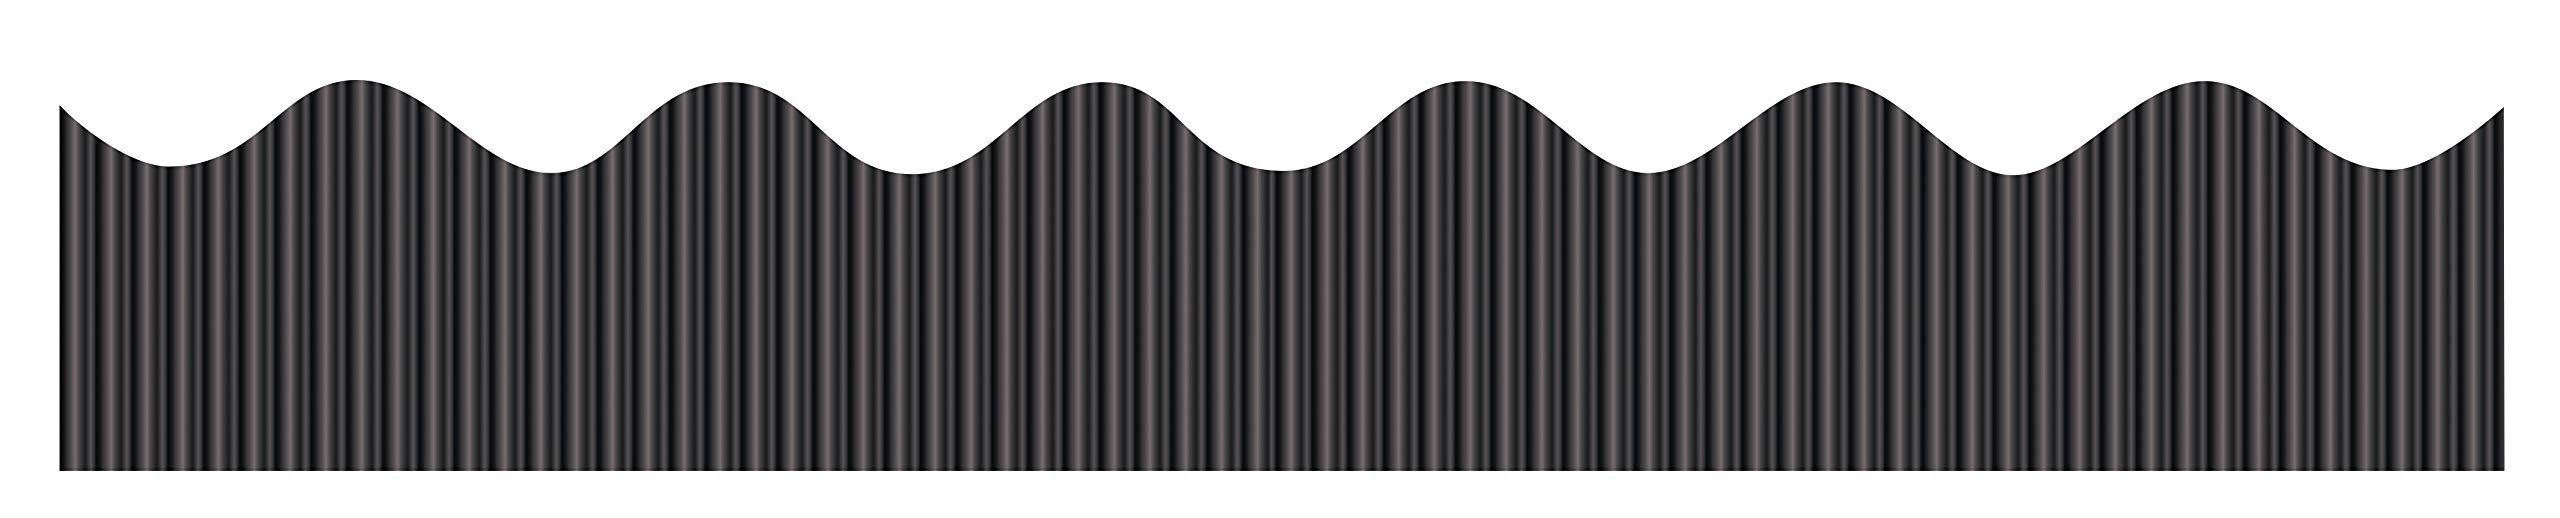 "Bordette Decorative Border, 2-1/4"" x 25', Metallic Black, 1 Roll"